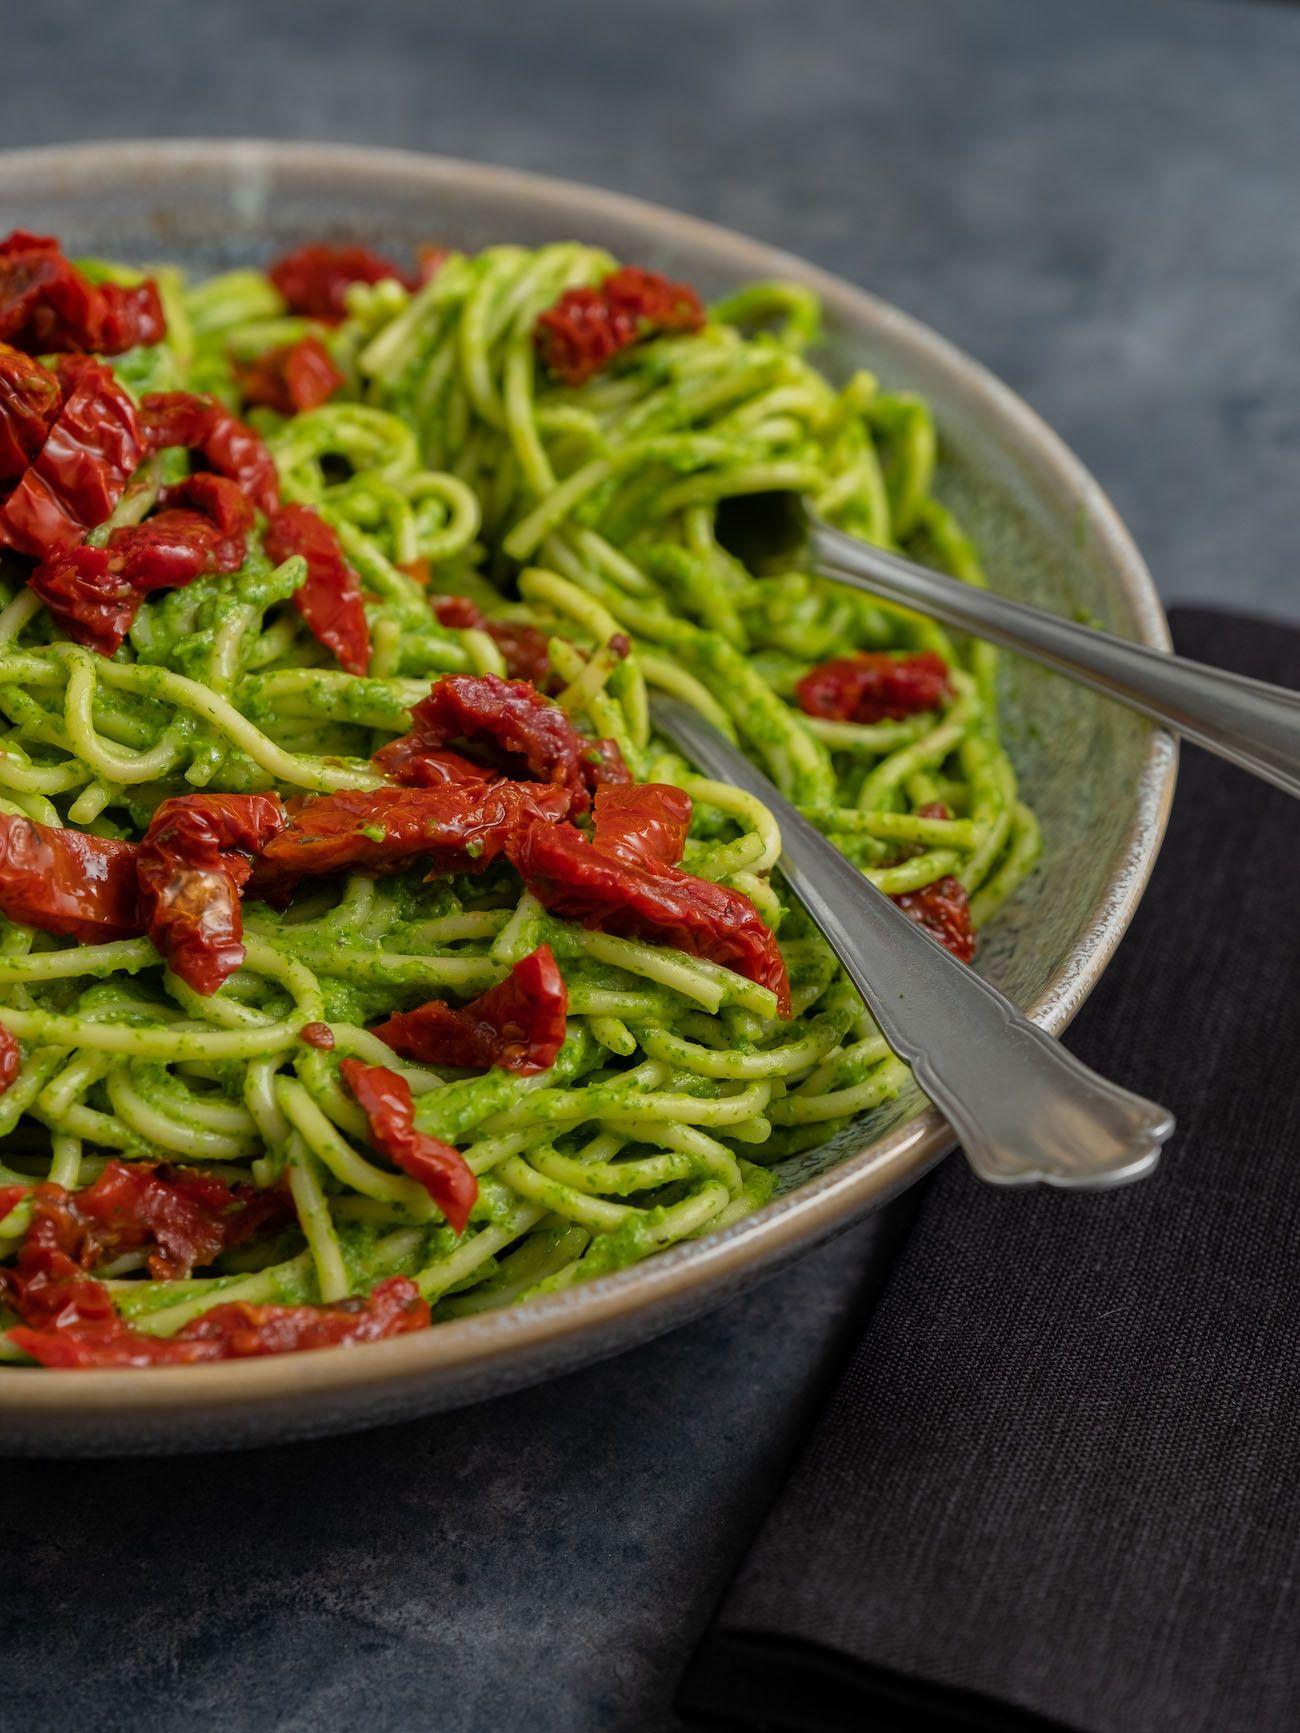 Foodblog, Rezept Spaghetti mit Avocado-Rucola-Pesto und getrockenten Tomaten, Bestesck, Pasta